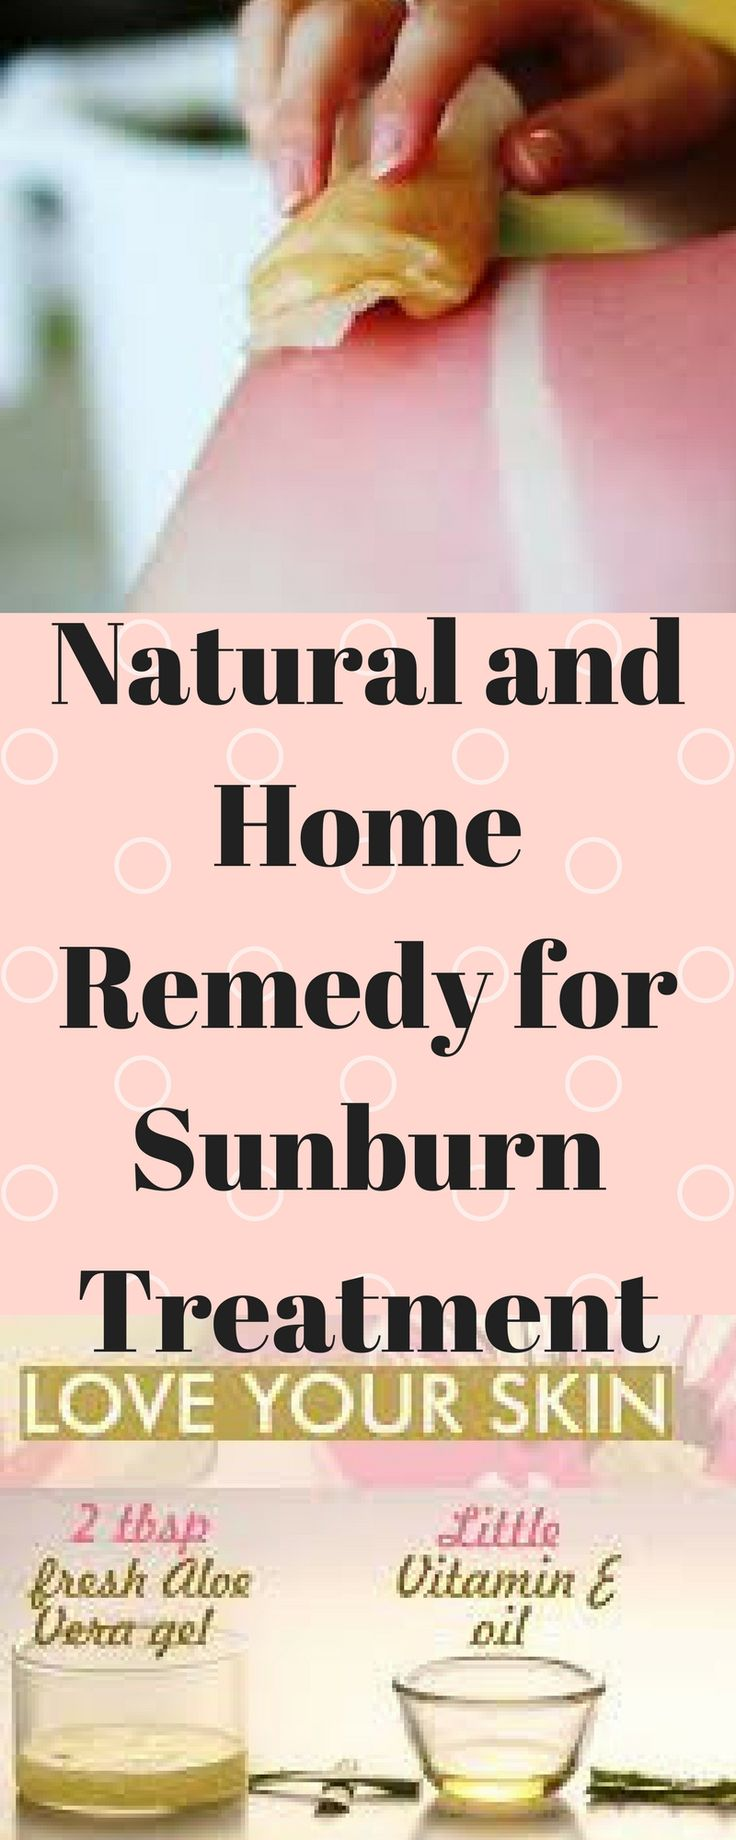 remedy-sunburn-   treatment/